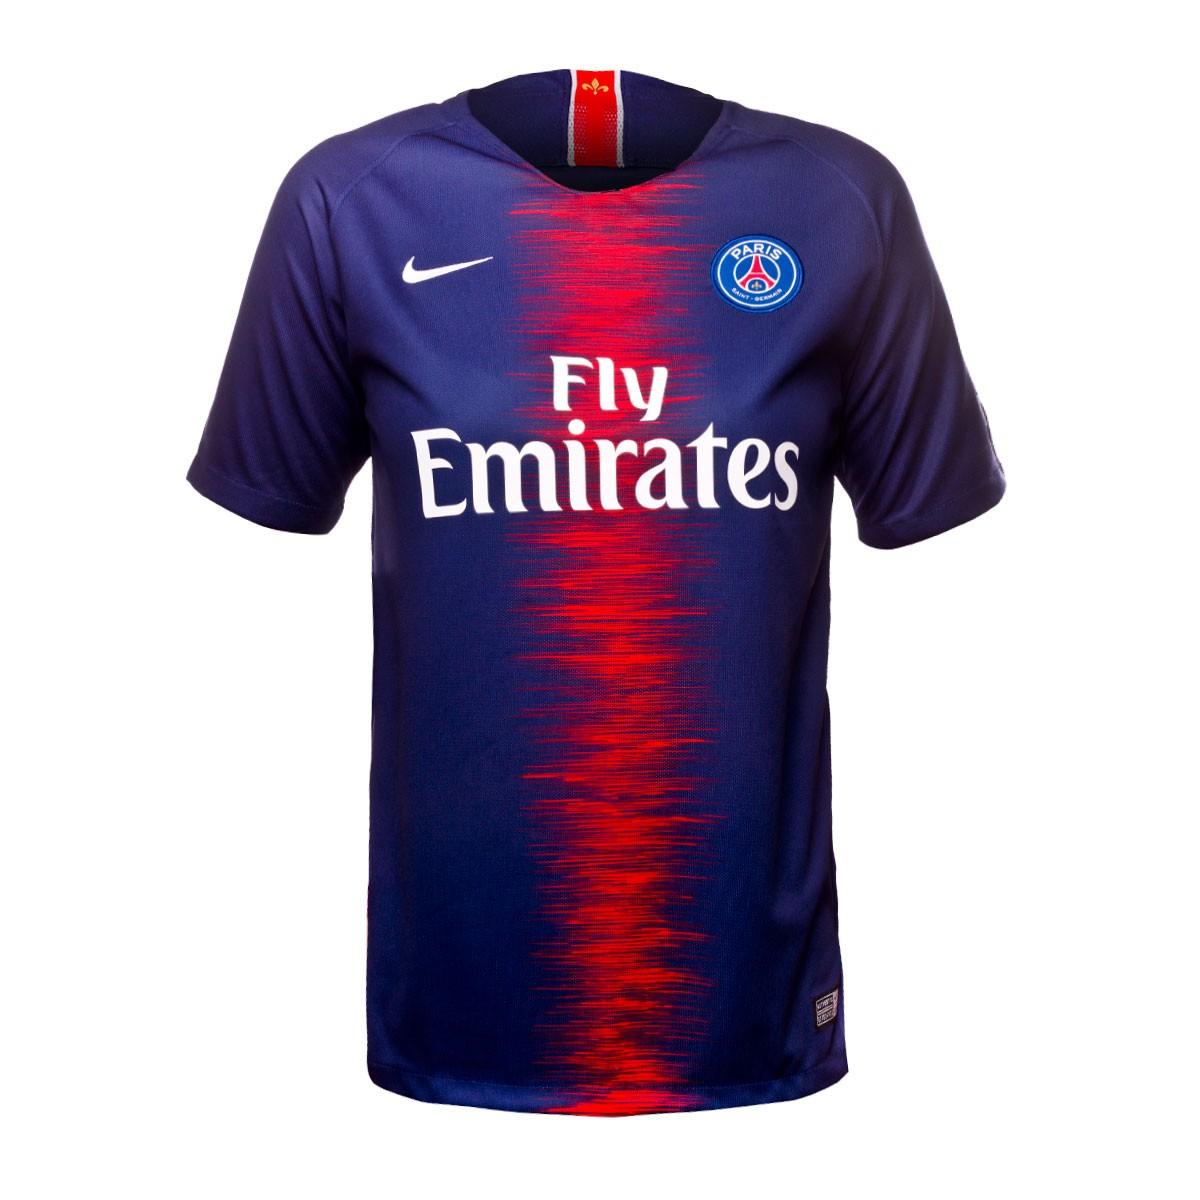 82d5663dc1360 Camiseta Nike Paris Saint-Germain Stadium Primera Equipación 2018-2019 Niño  Midnight navy-White - Tienda de fútbol Fútbol Emotion